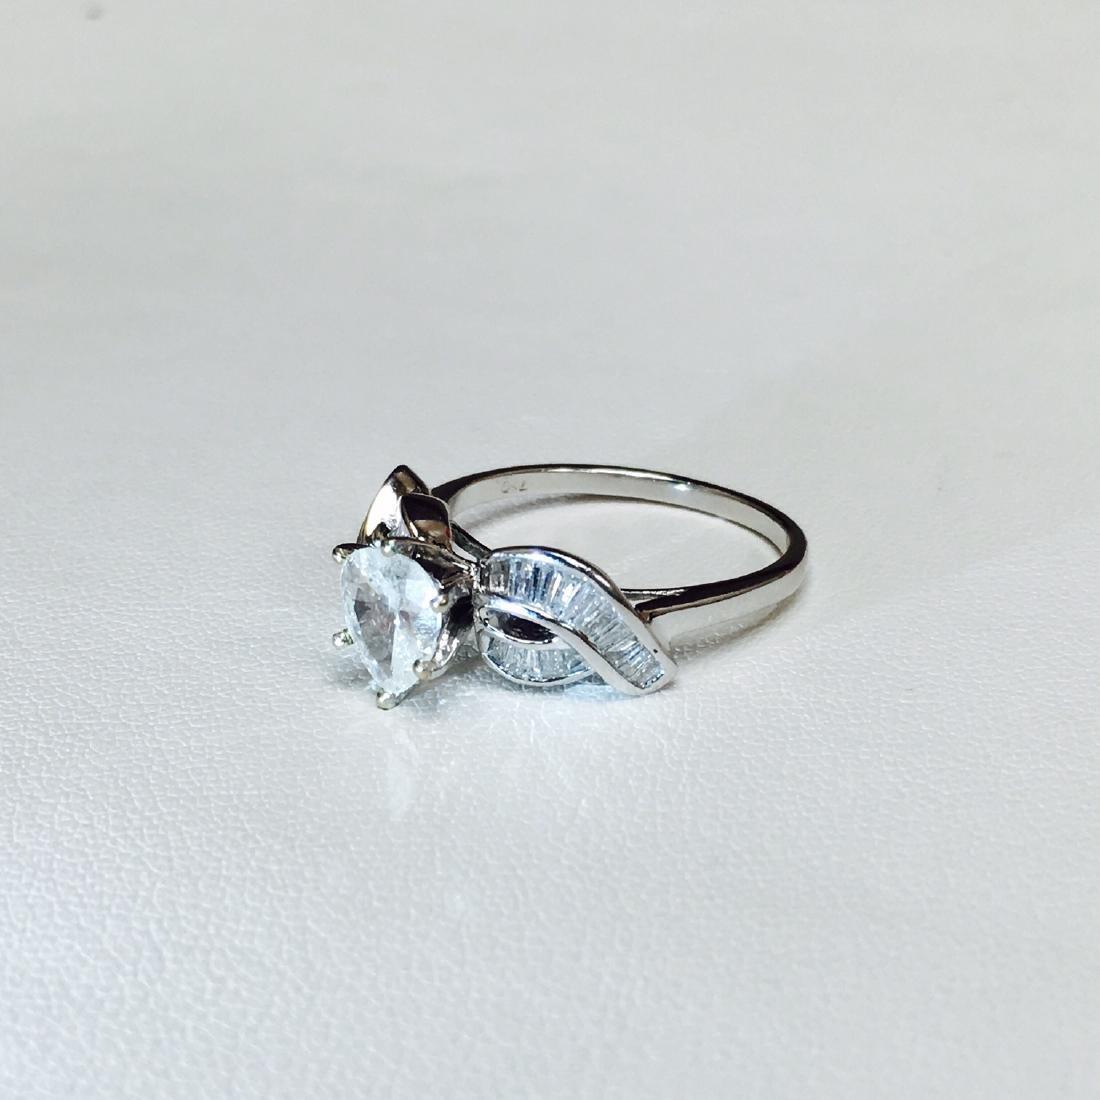 14k White Gold And 1.20 Carat Diamond Engagement Ring - 2